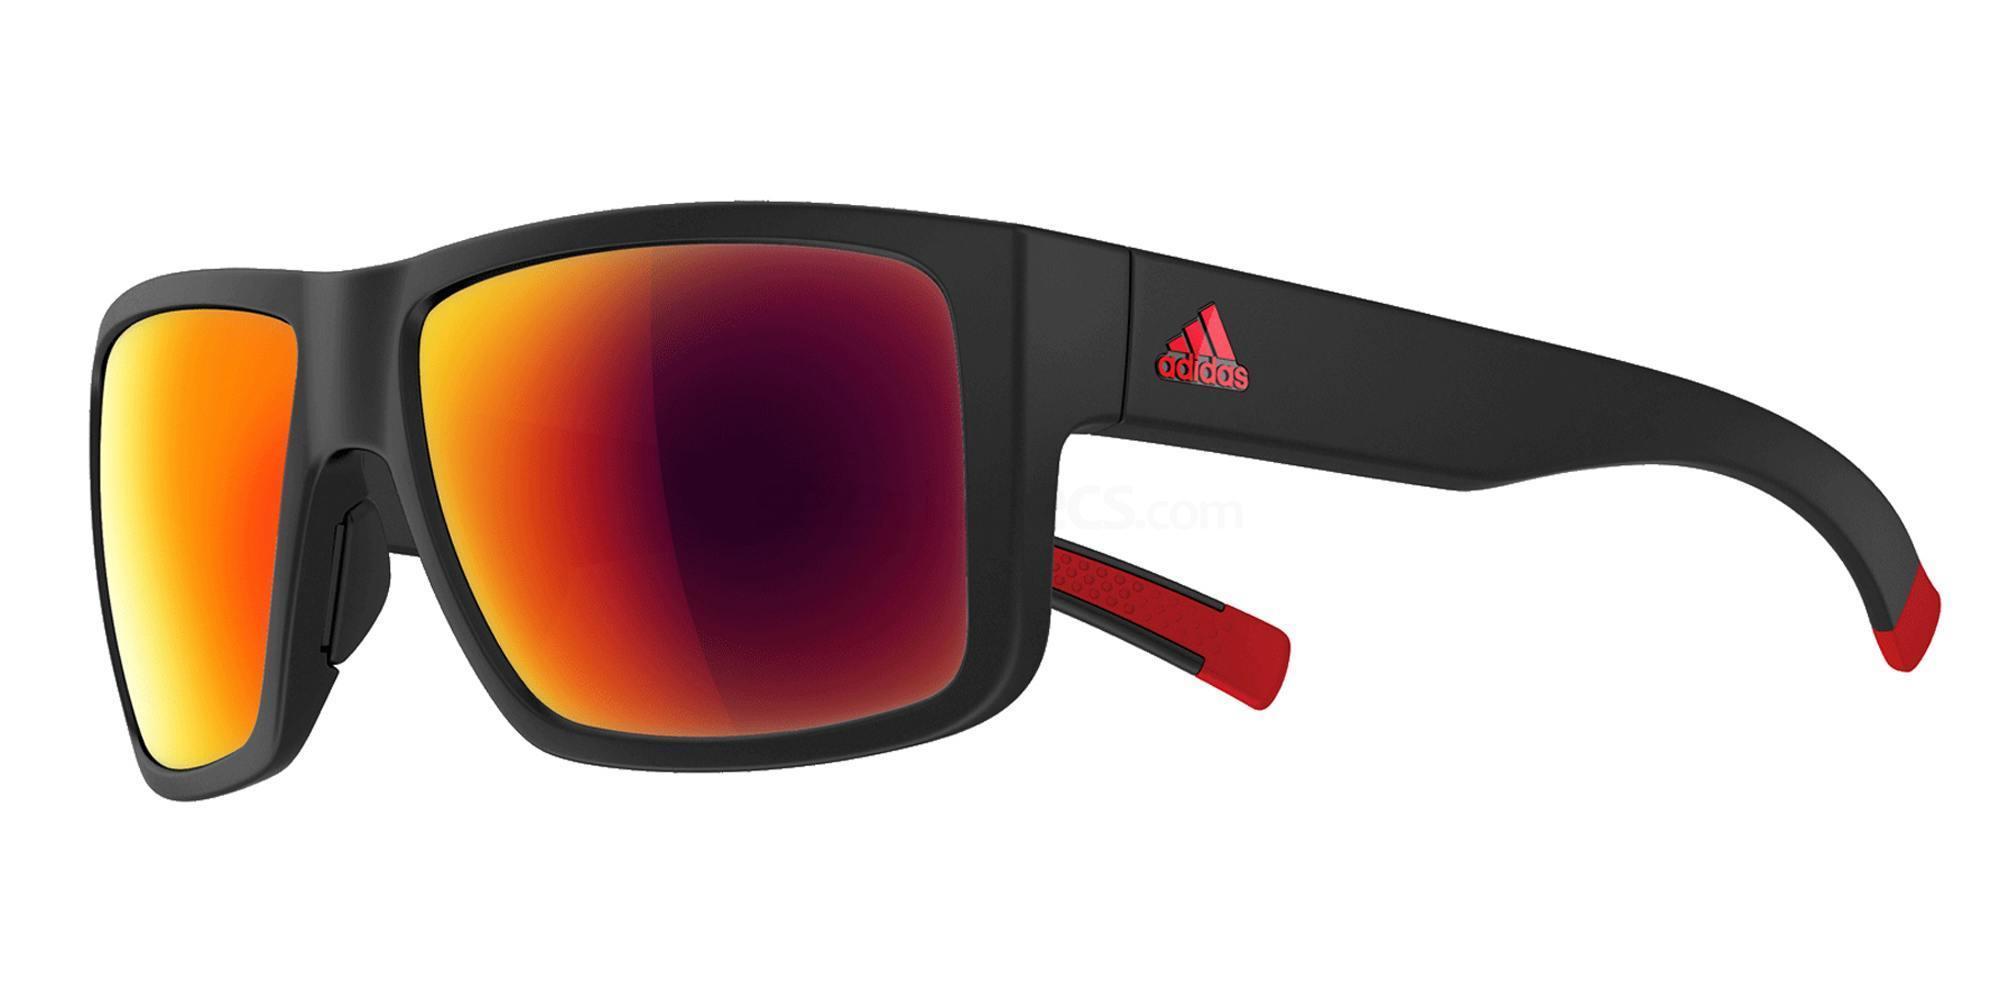 a426 00 6055 a426 matic Sunglasses, Adidas